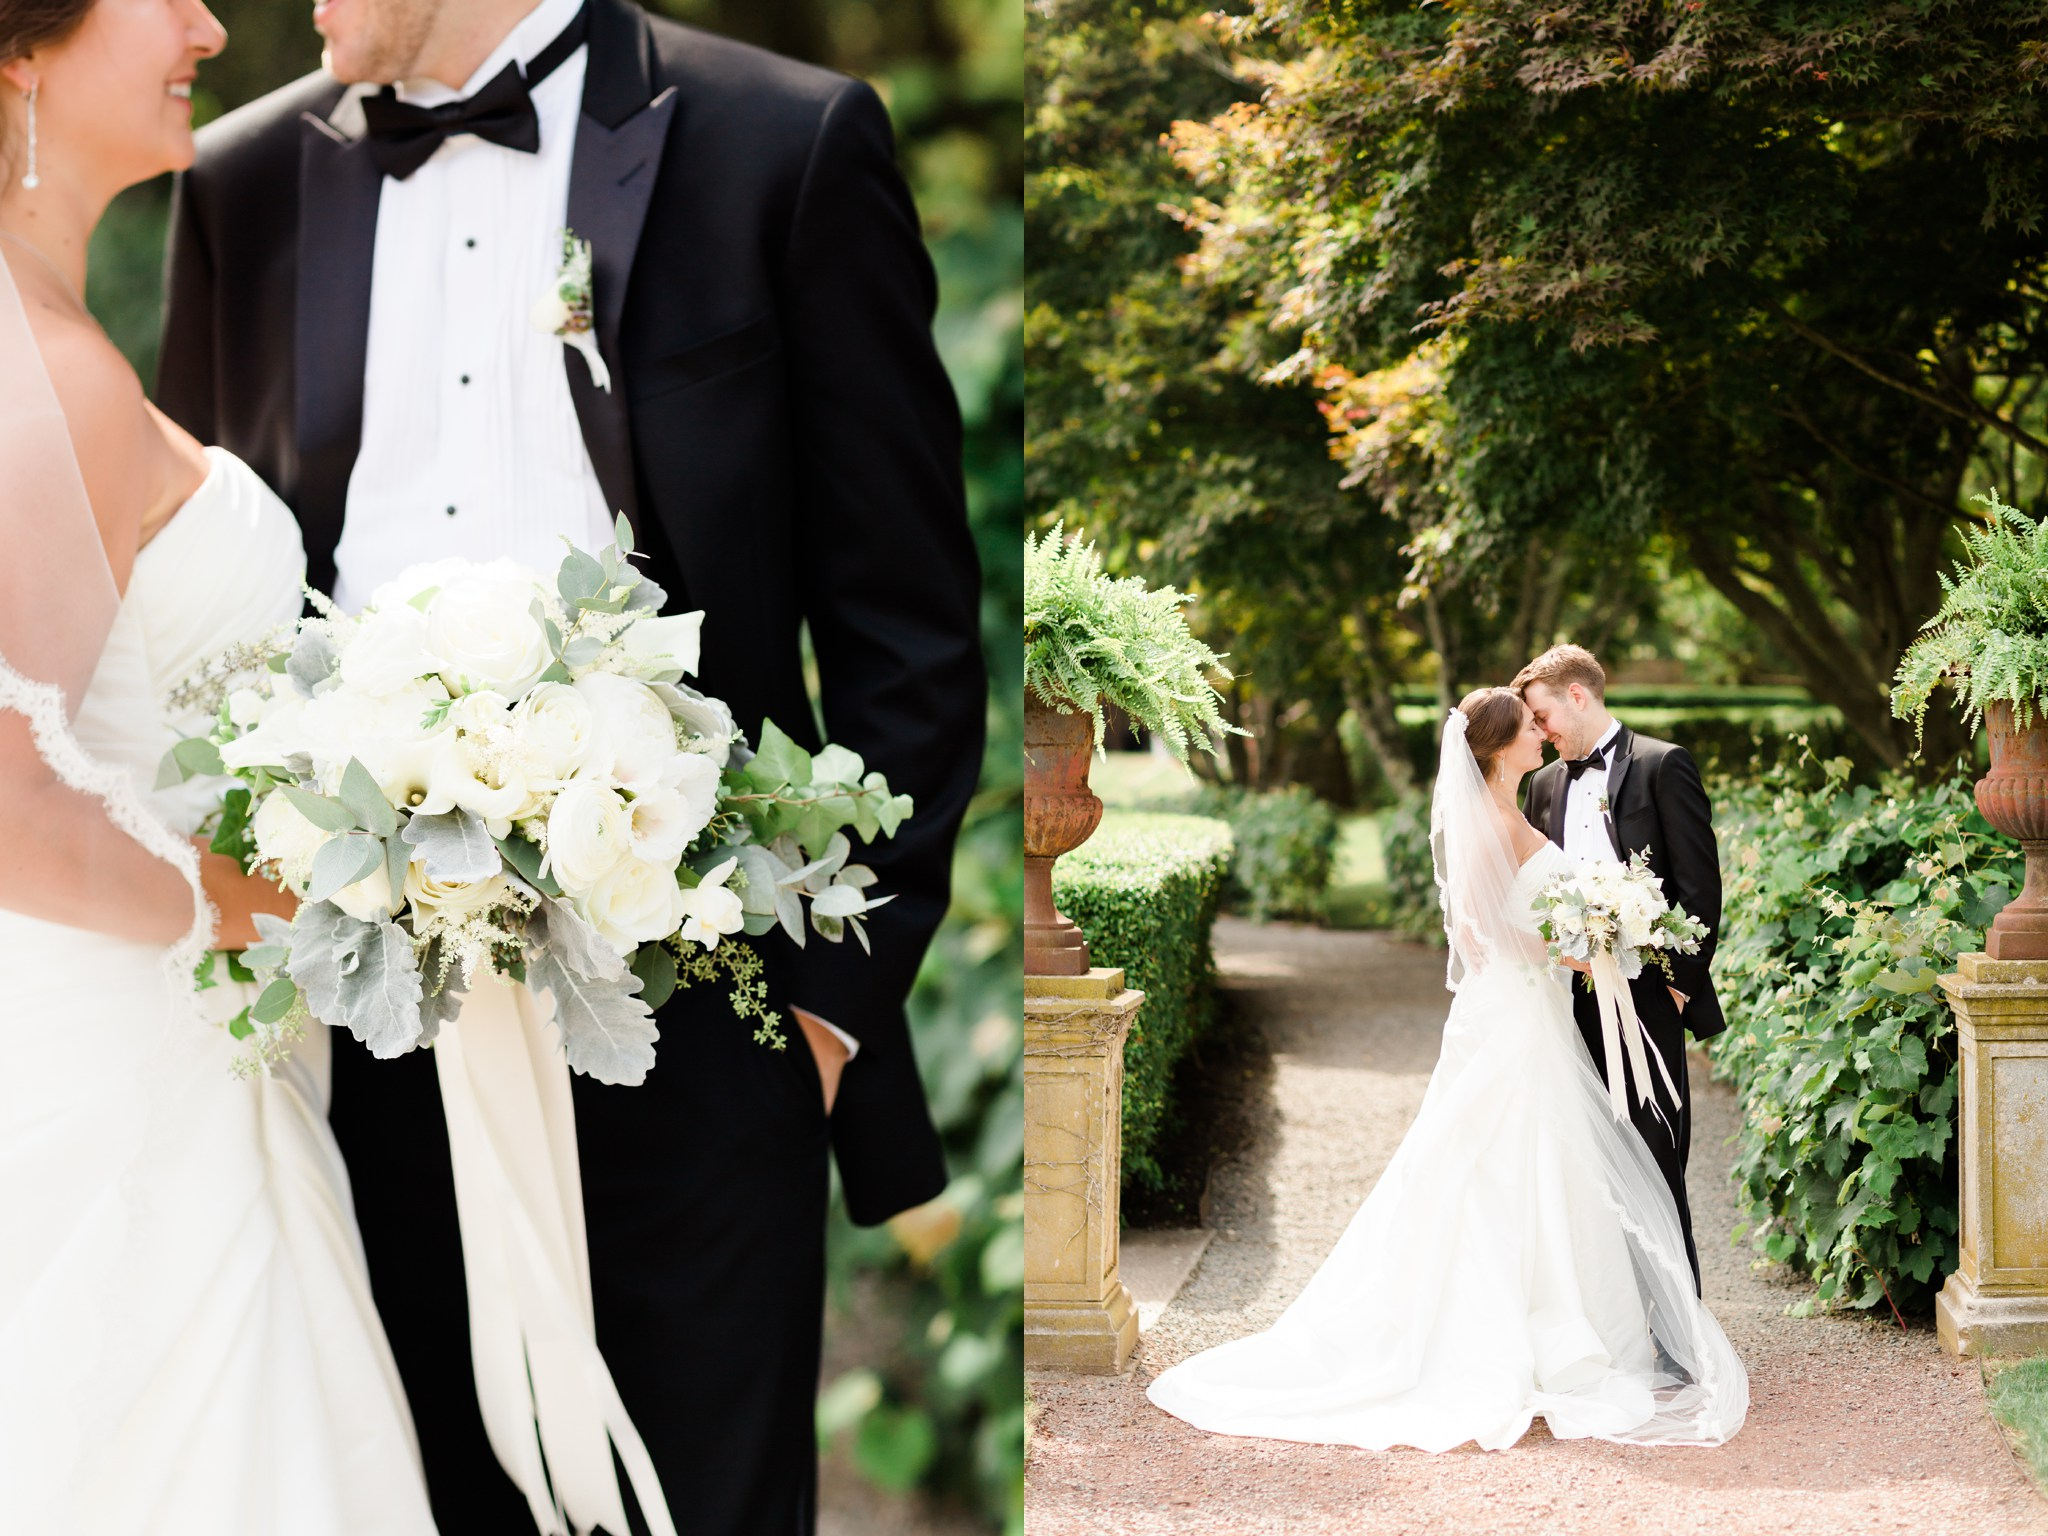 turner_hill_wedding_photos_00024.JPG